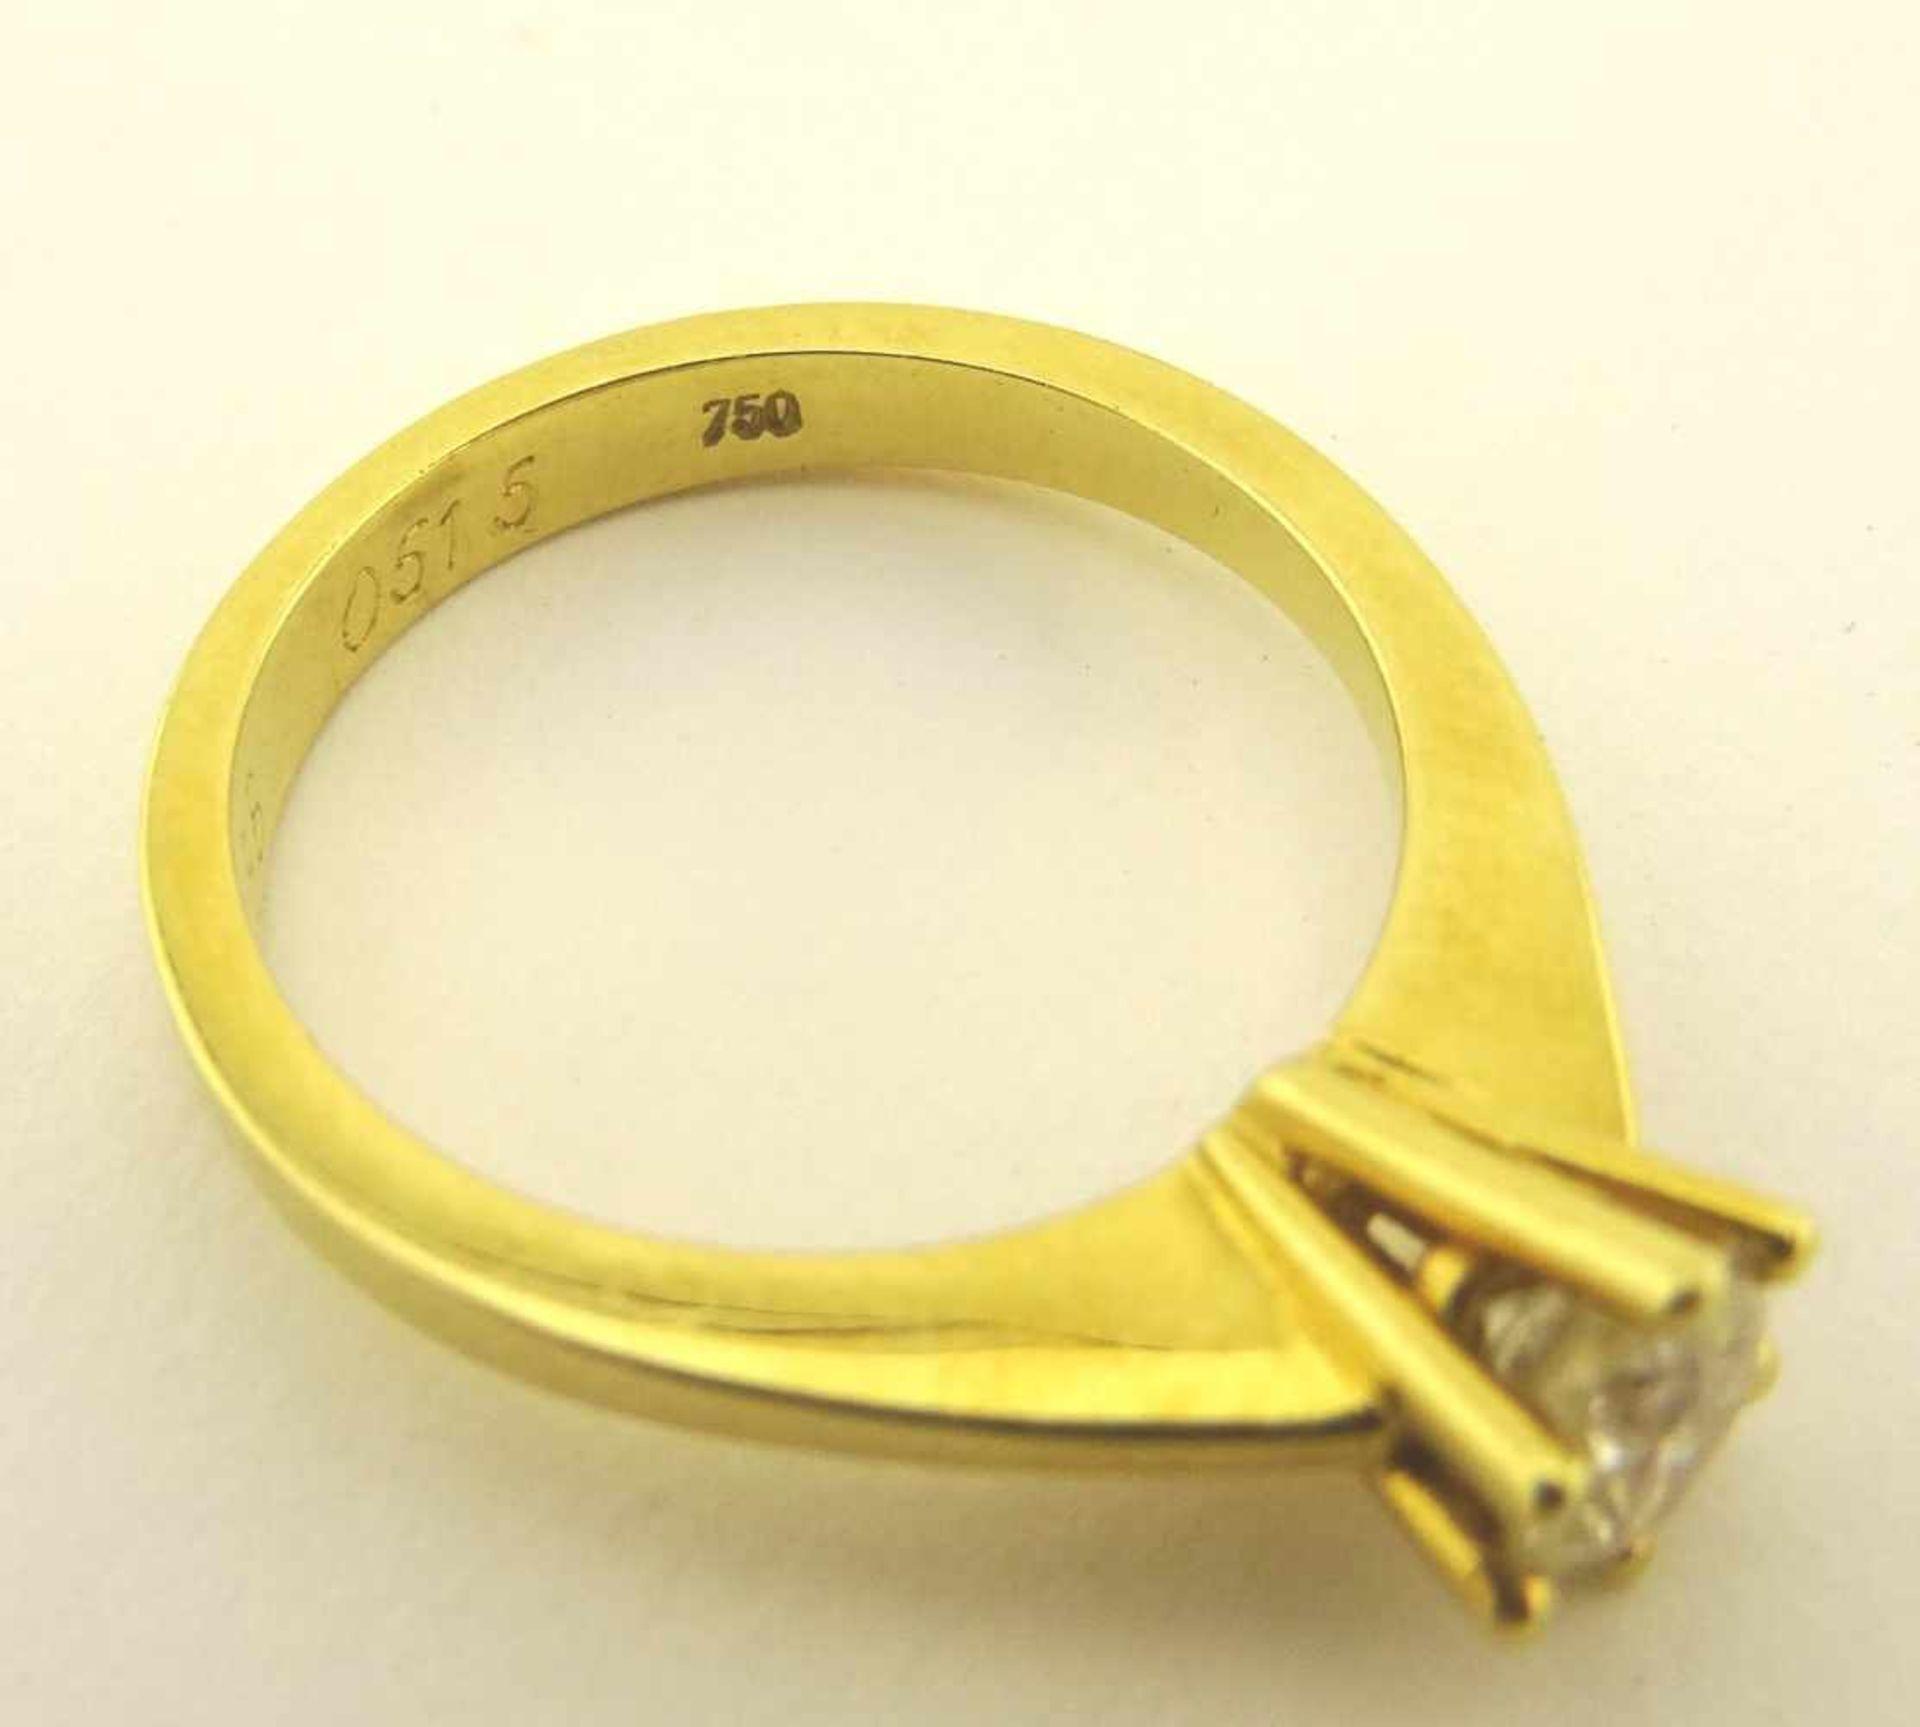 Los 22 - Damenring Brillant Solitär 750 Gold Solitär Damenbrillantring mit Brillant ca. 0,51 ct. Crystal / IF